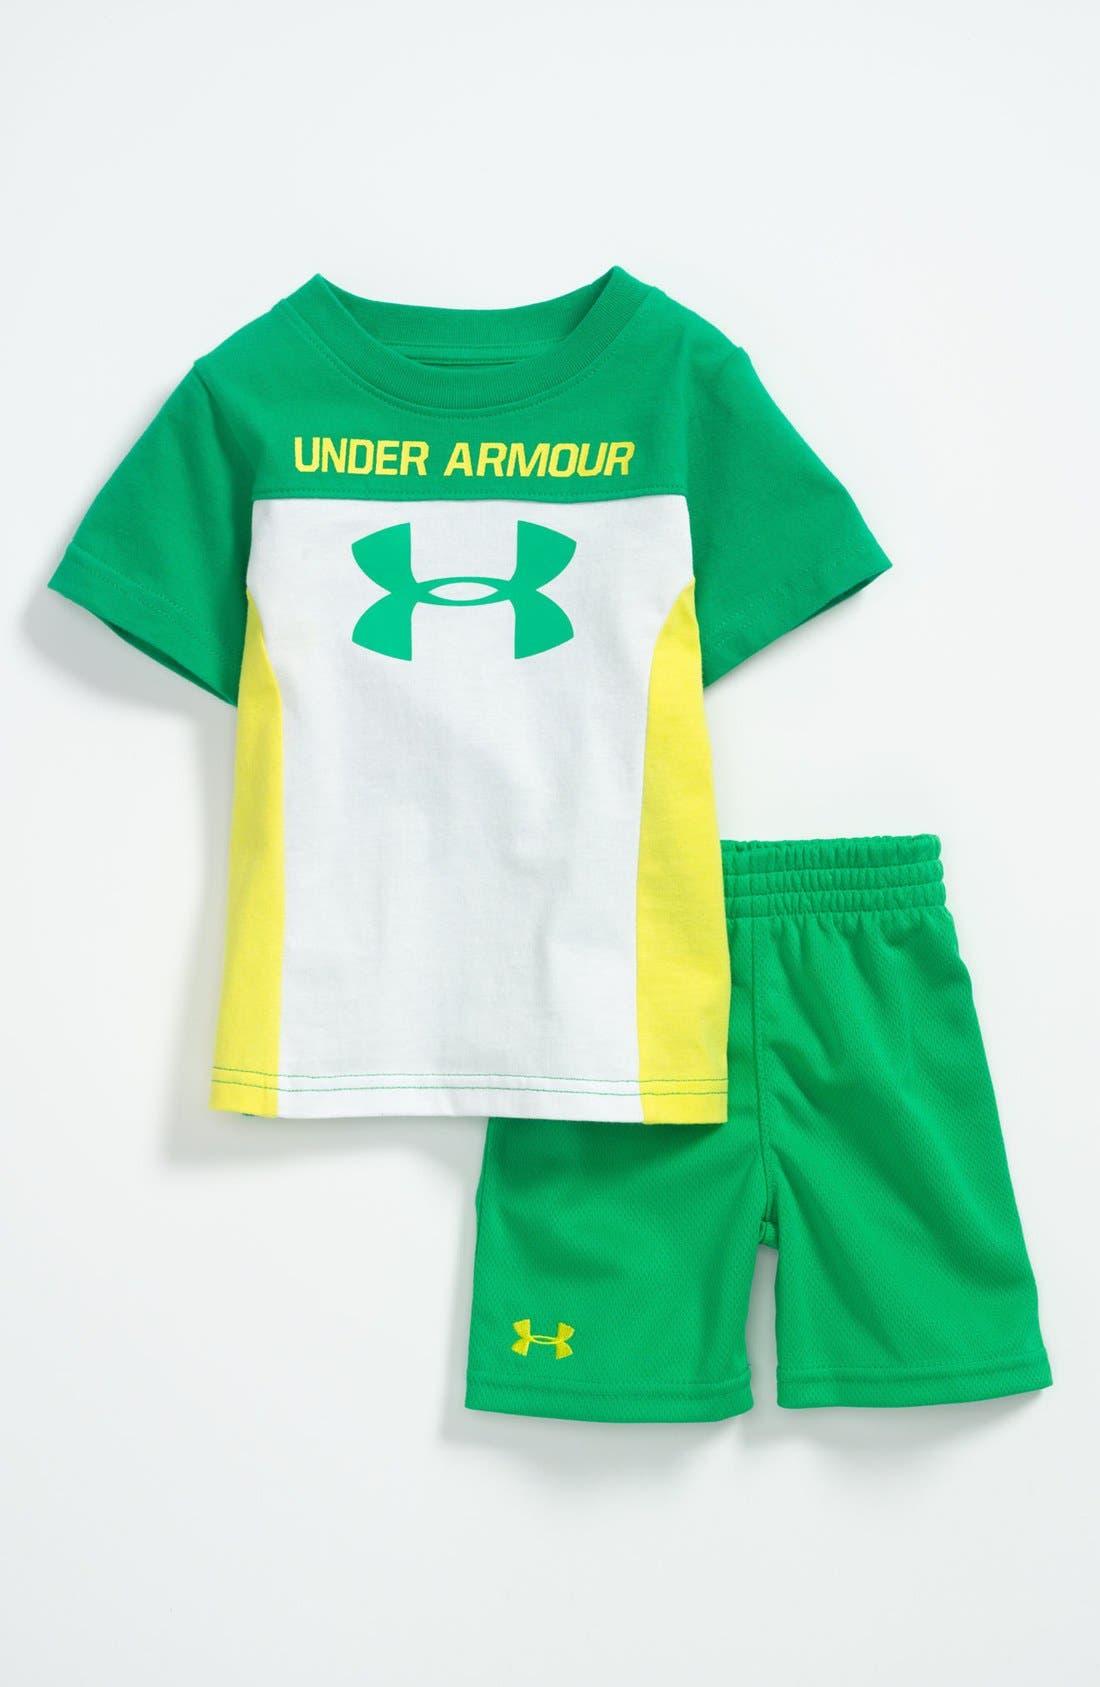 Main Image - Under Armour 'Mixed Media' T-Shirt & Shorts (Baby)